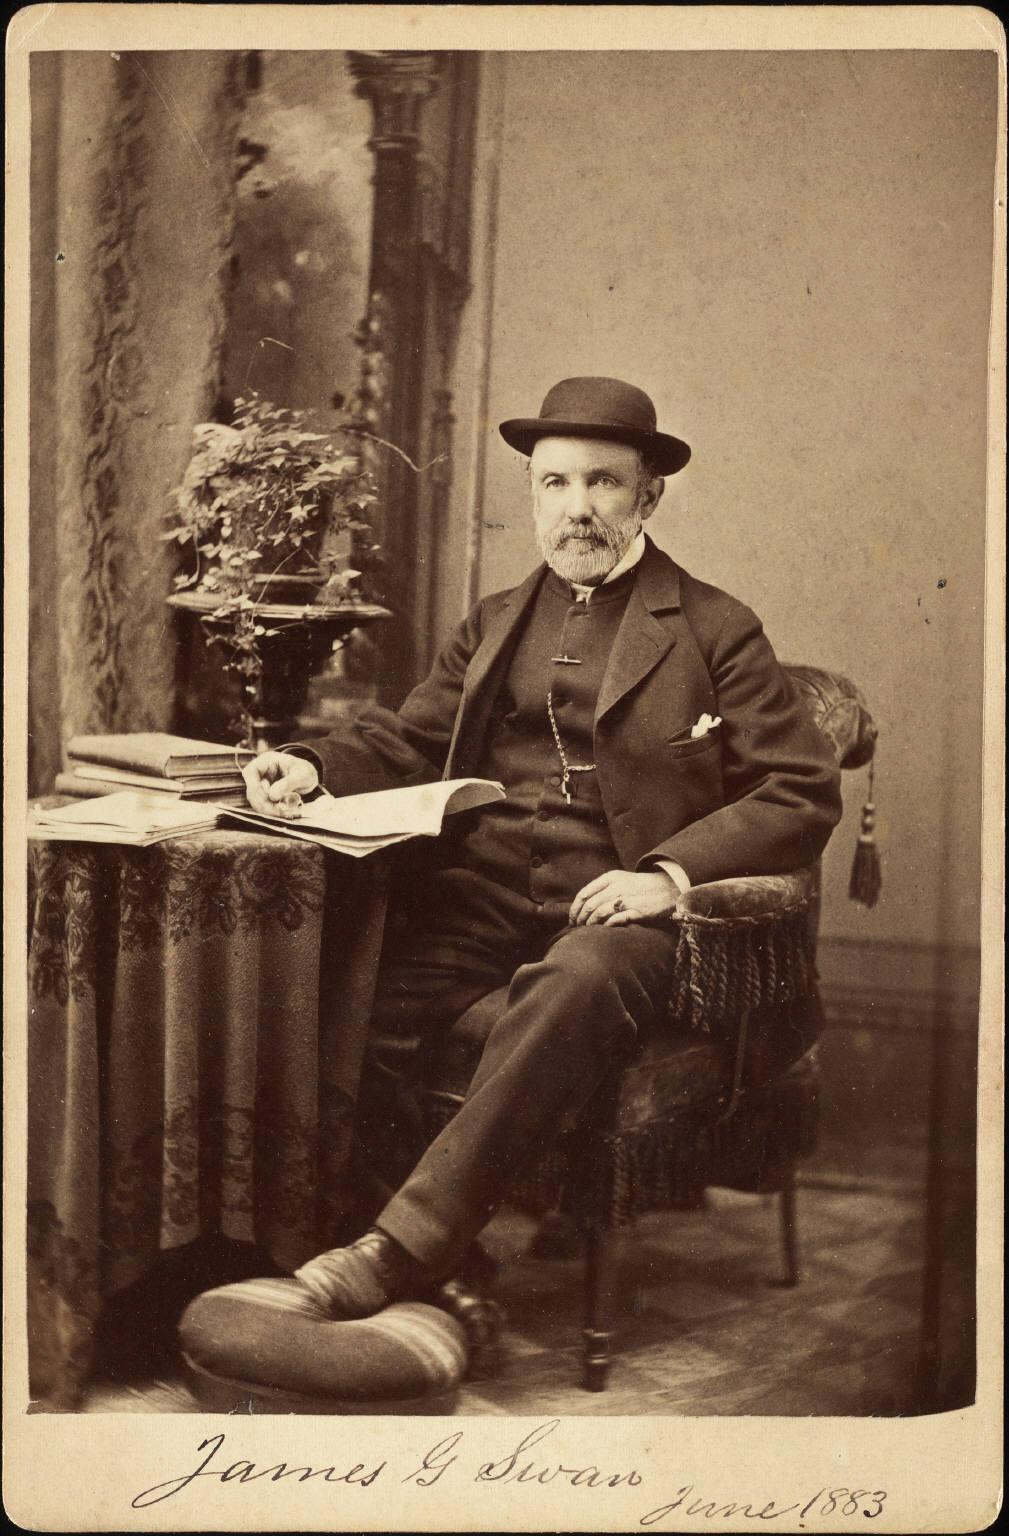 James G. Swan